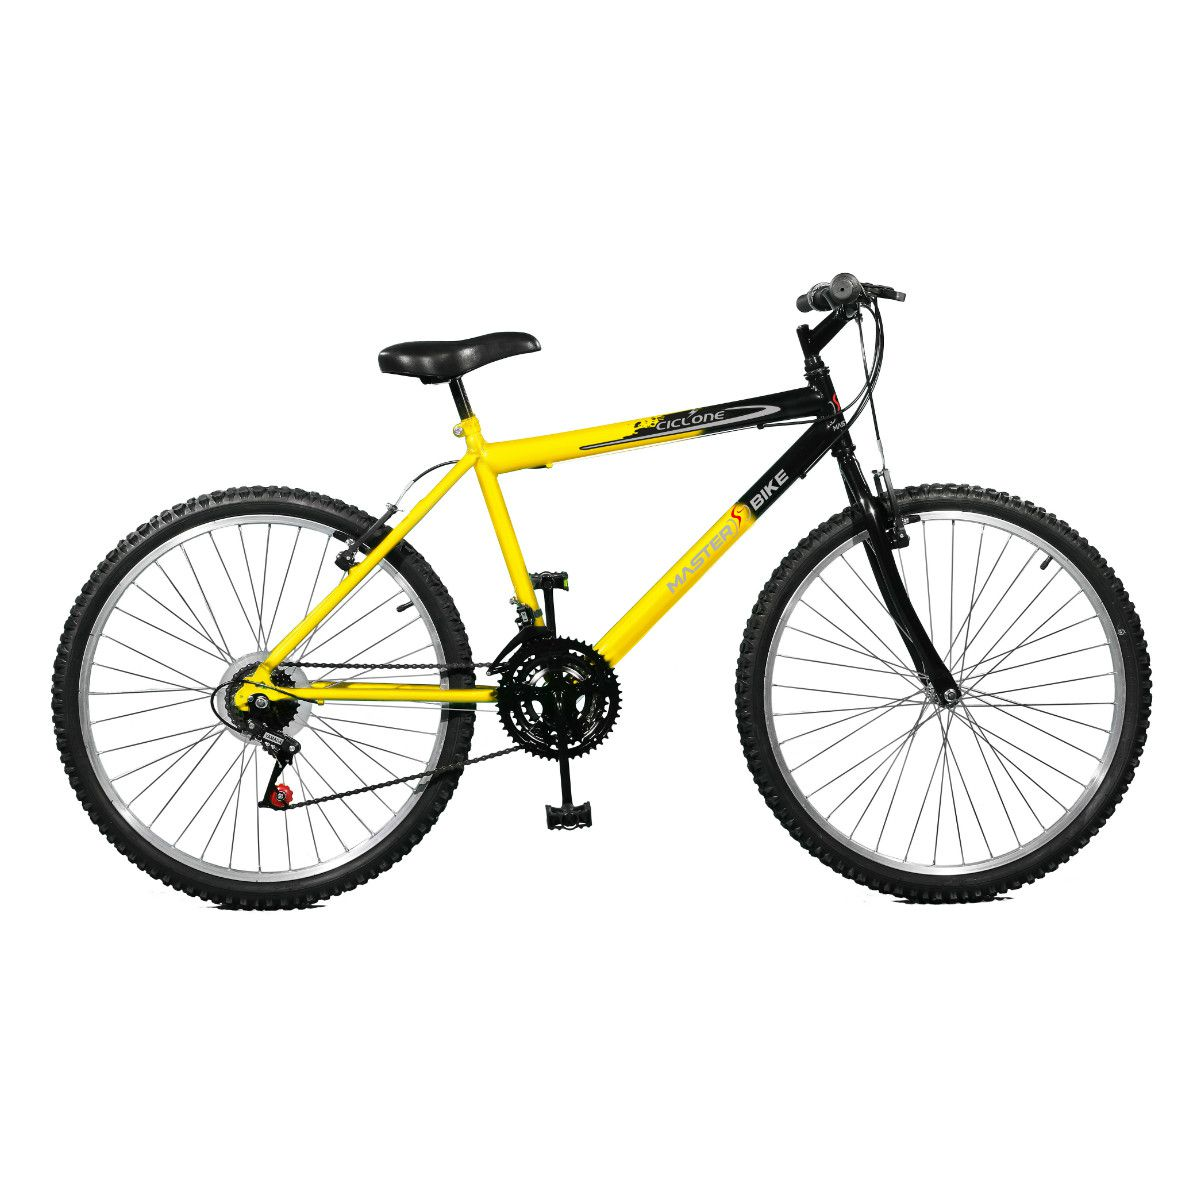 Bicicleta Master Bike Aro 26 Ciclone Plus 21 Marchas V-Brake Amarelo/Preto